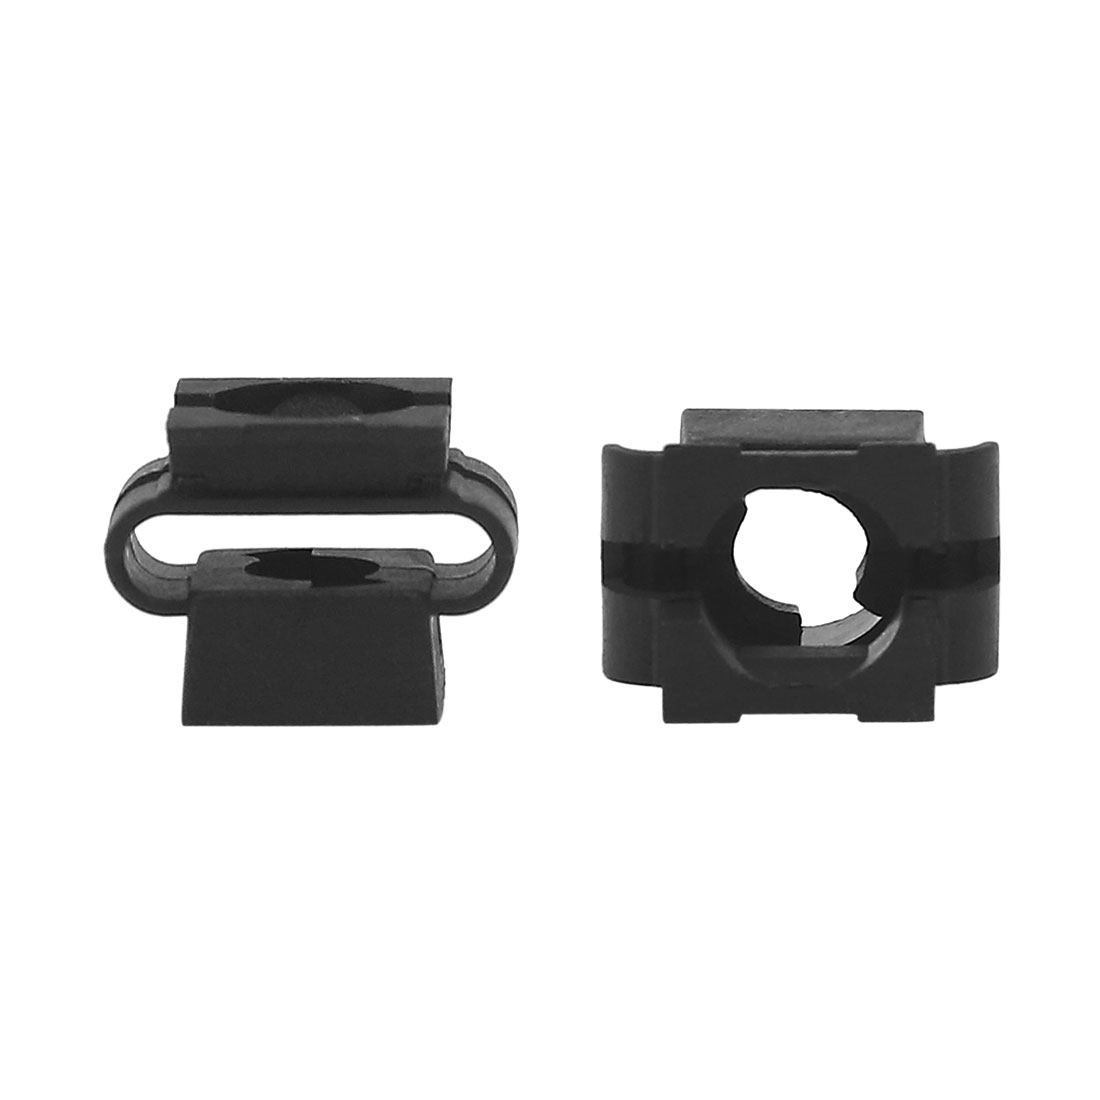 50Pcs Black Car Vehicle Plastic Rivets Fastener Fender Bumper Push Pin Clips